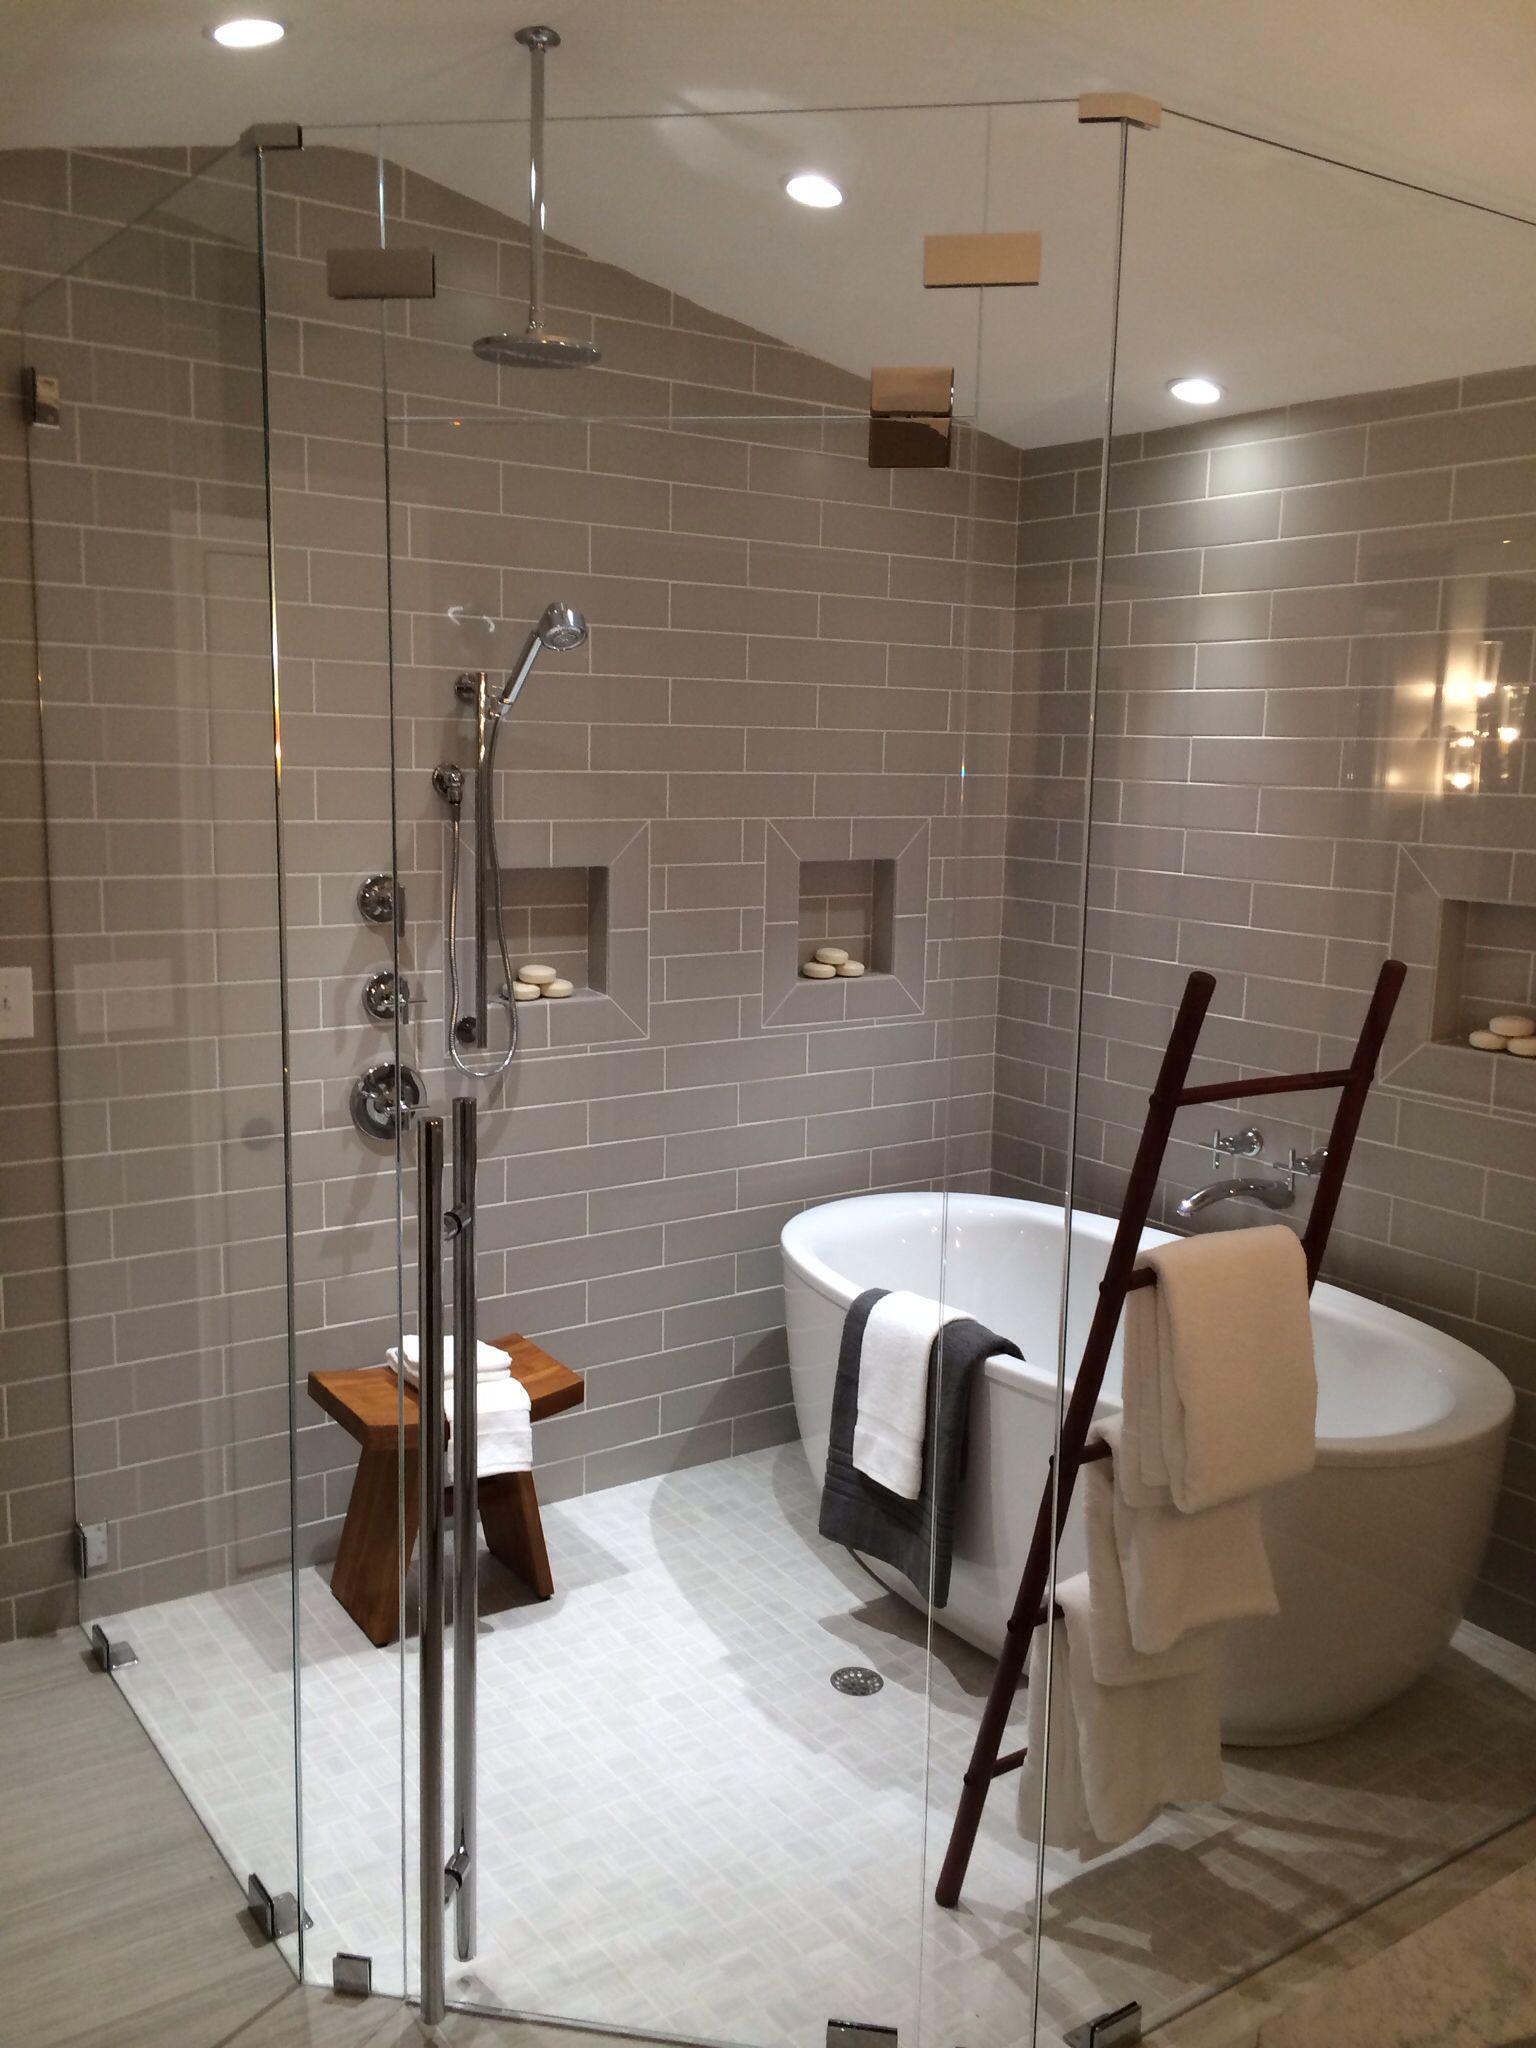 48 Ladder Handle In Polished Chrome Shower Door Handles Bathroom Design Concepts Wet Rooms